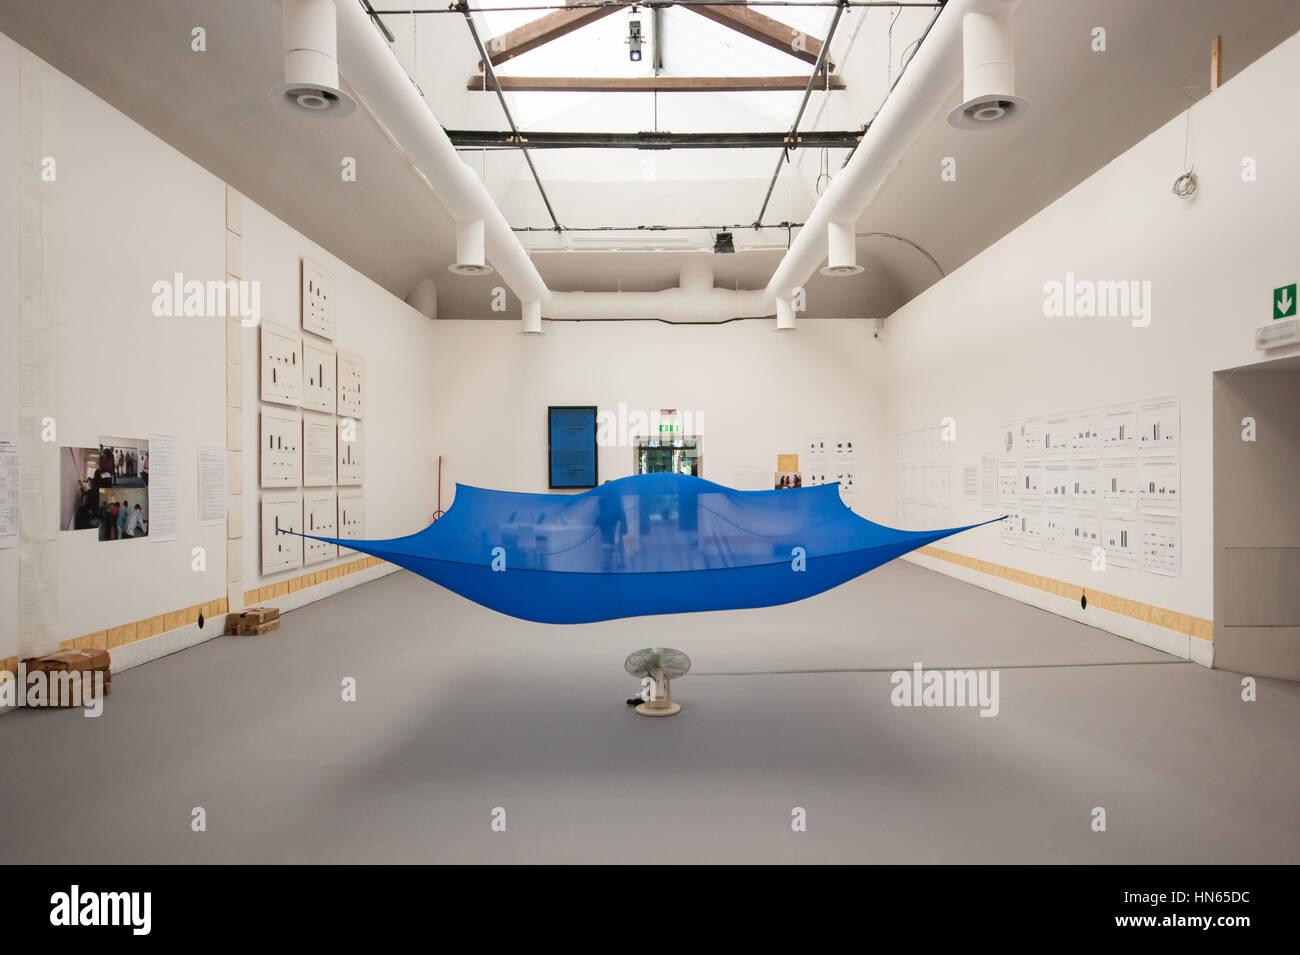 Venice Art Biennale 2015, the installation Blue Sail by German born American contemporary artist Hans Haacke - Stock Image